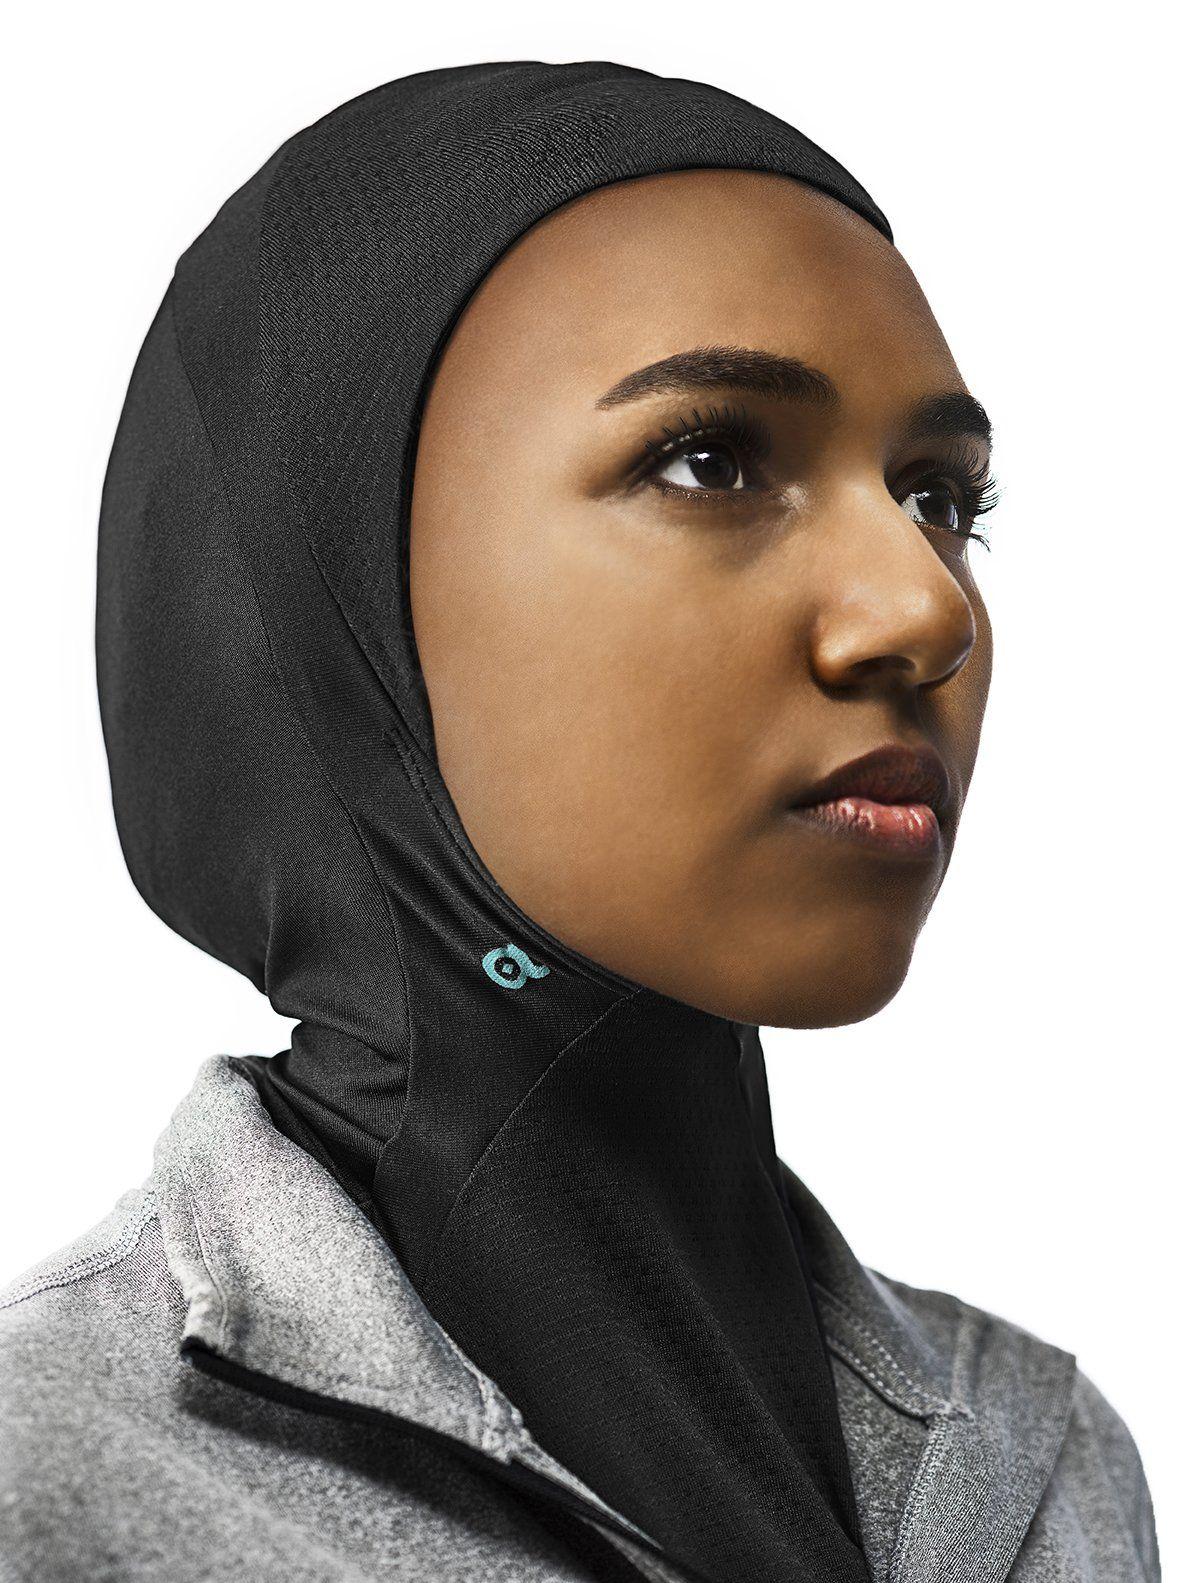 Asiya Sport Sports Hijab Sports Illustrated Swimsuit Hot High Fashion Looks